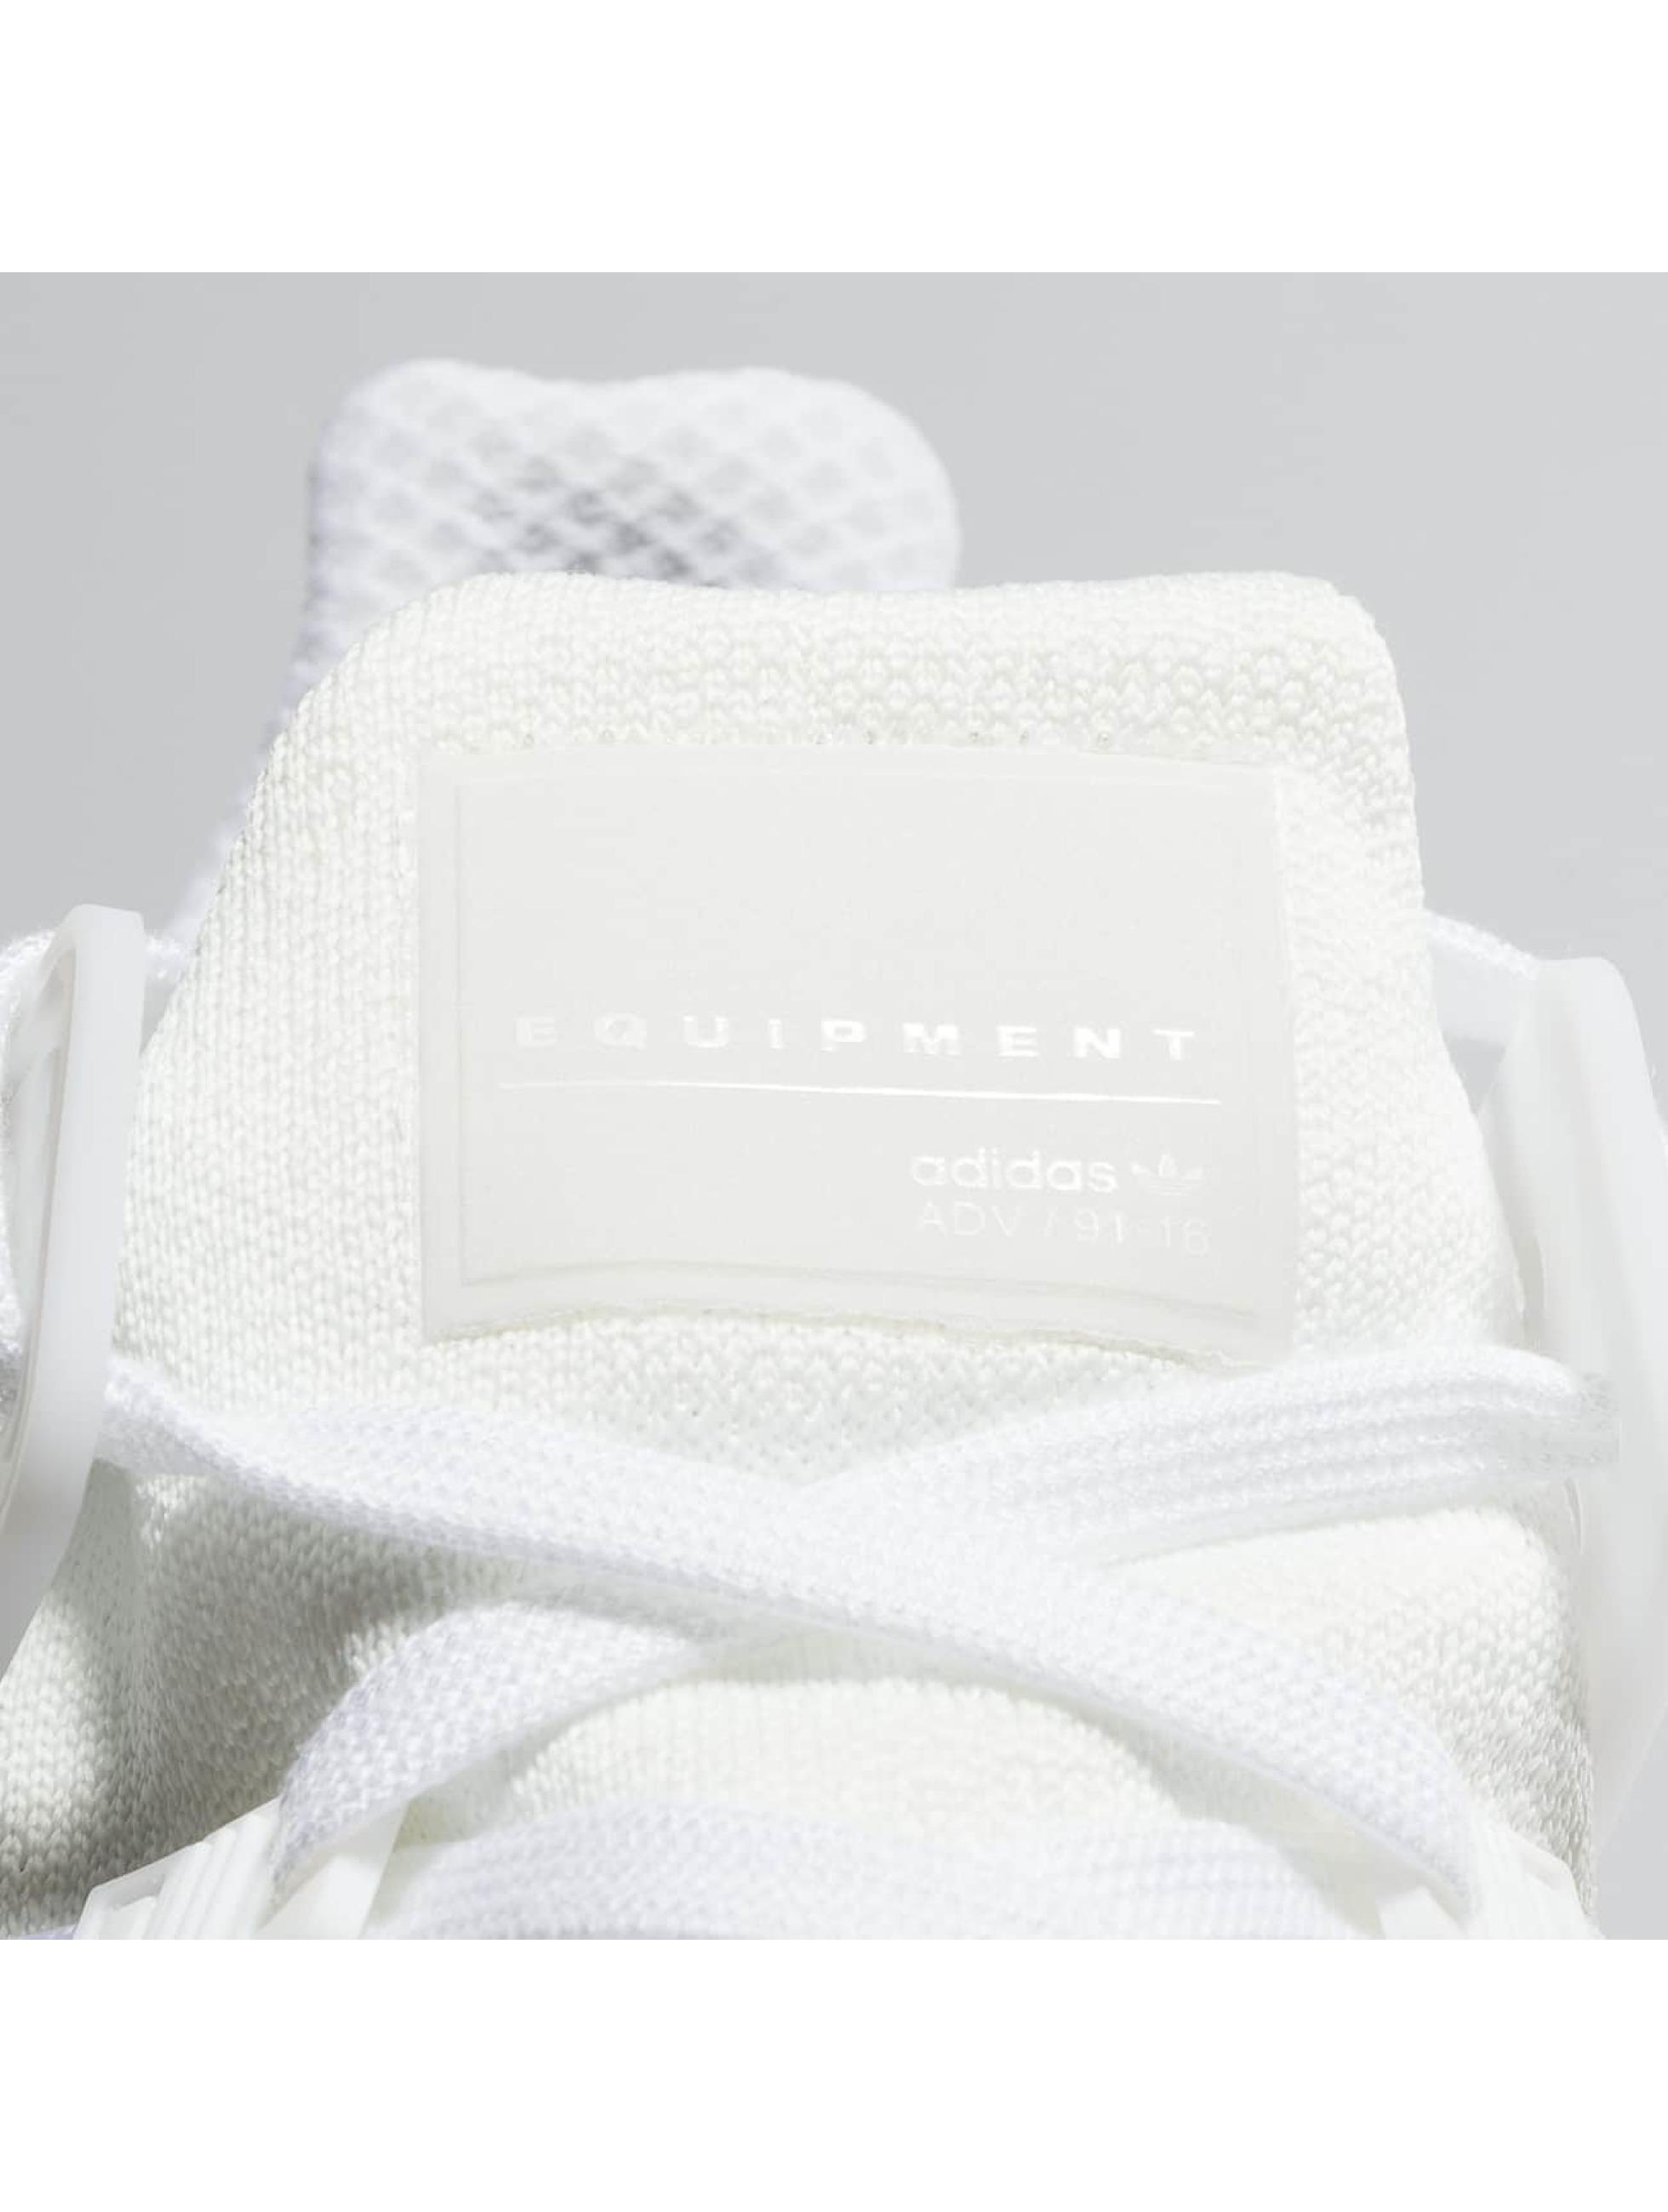 adidas Tøysko Equipment Support ADV hvit